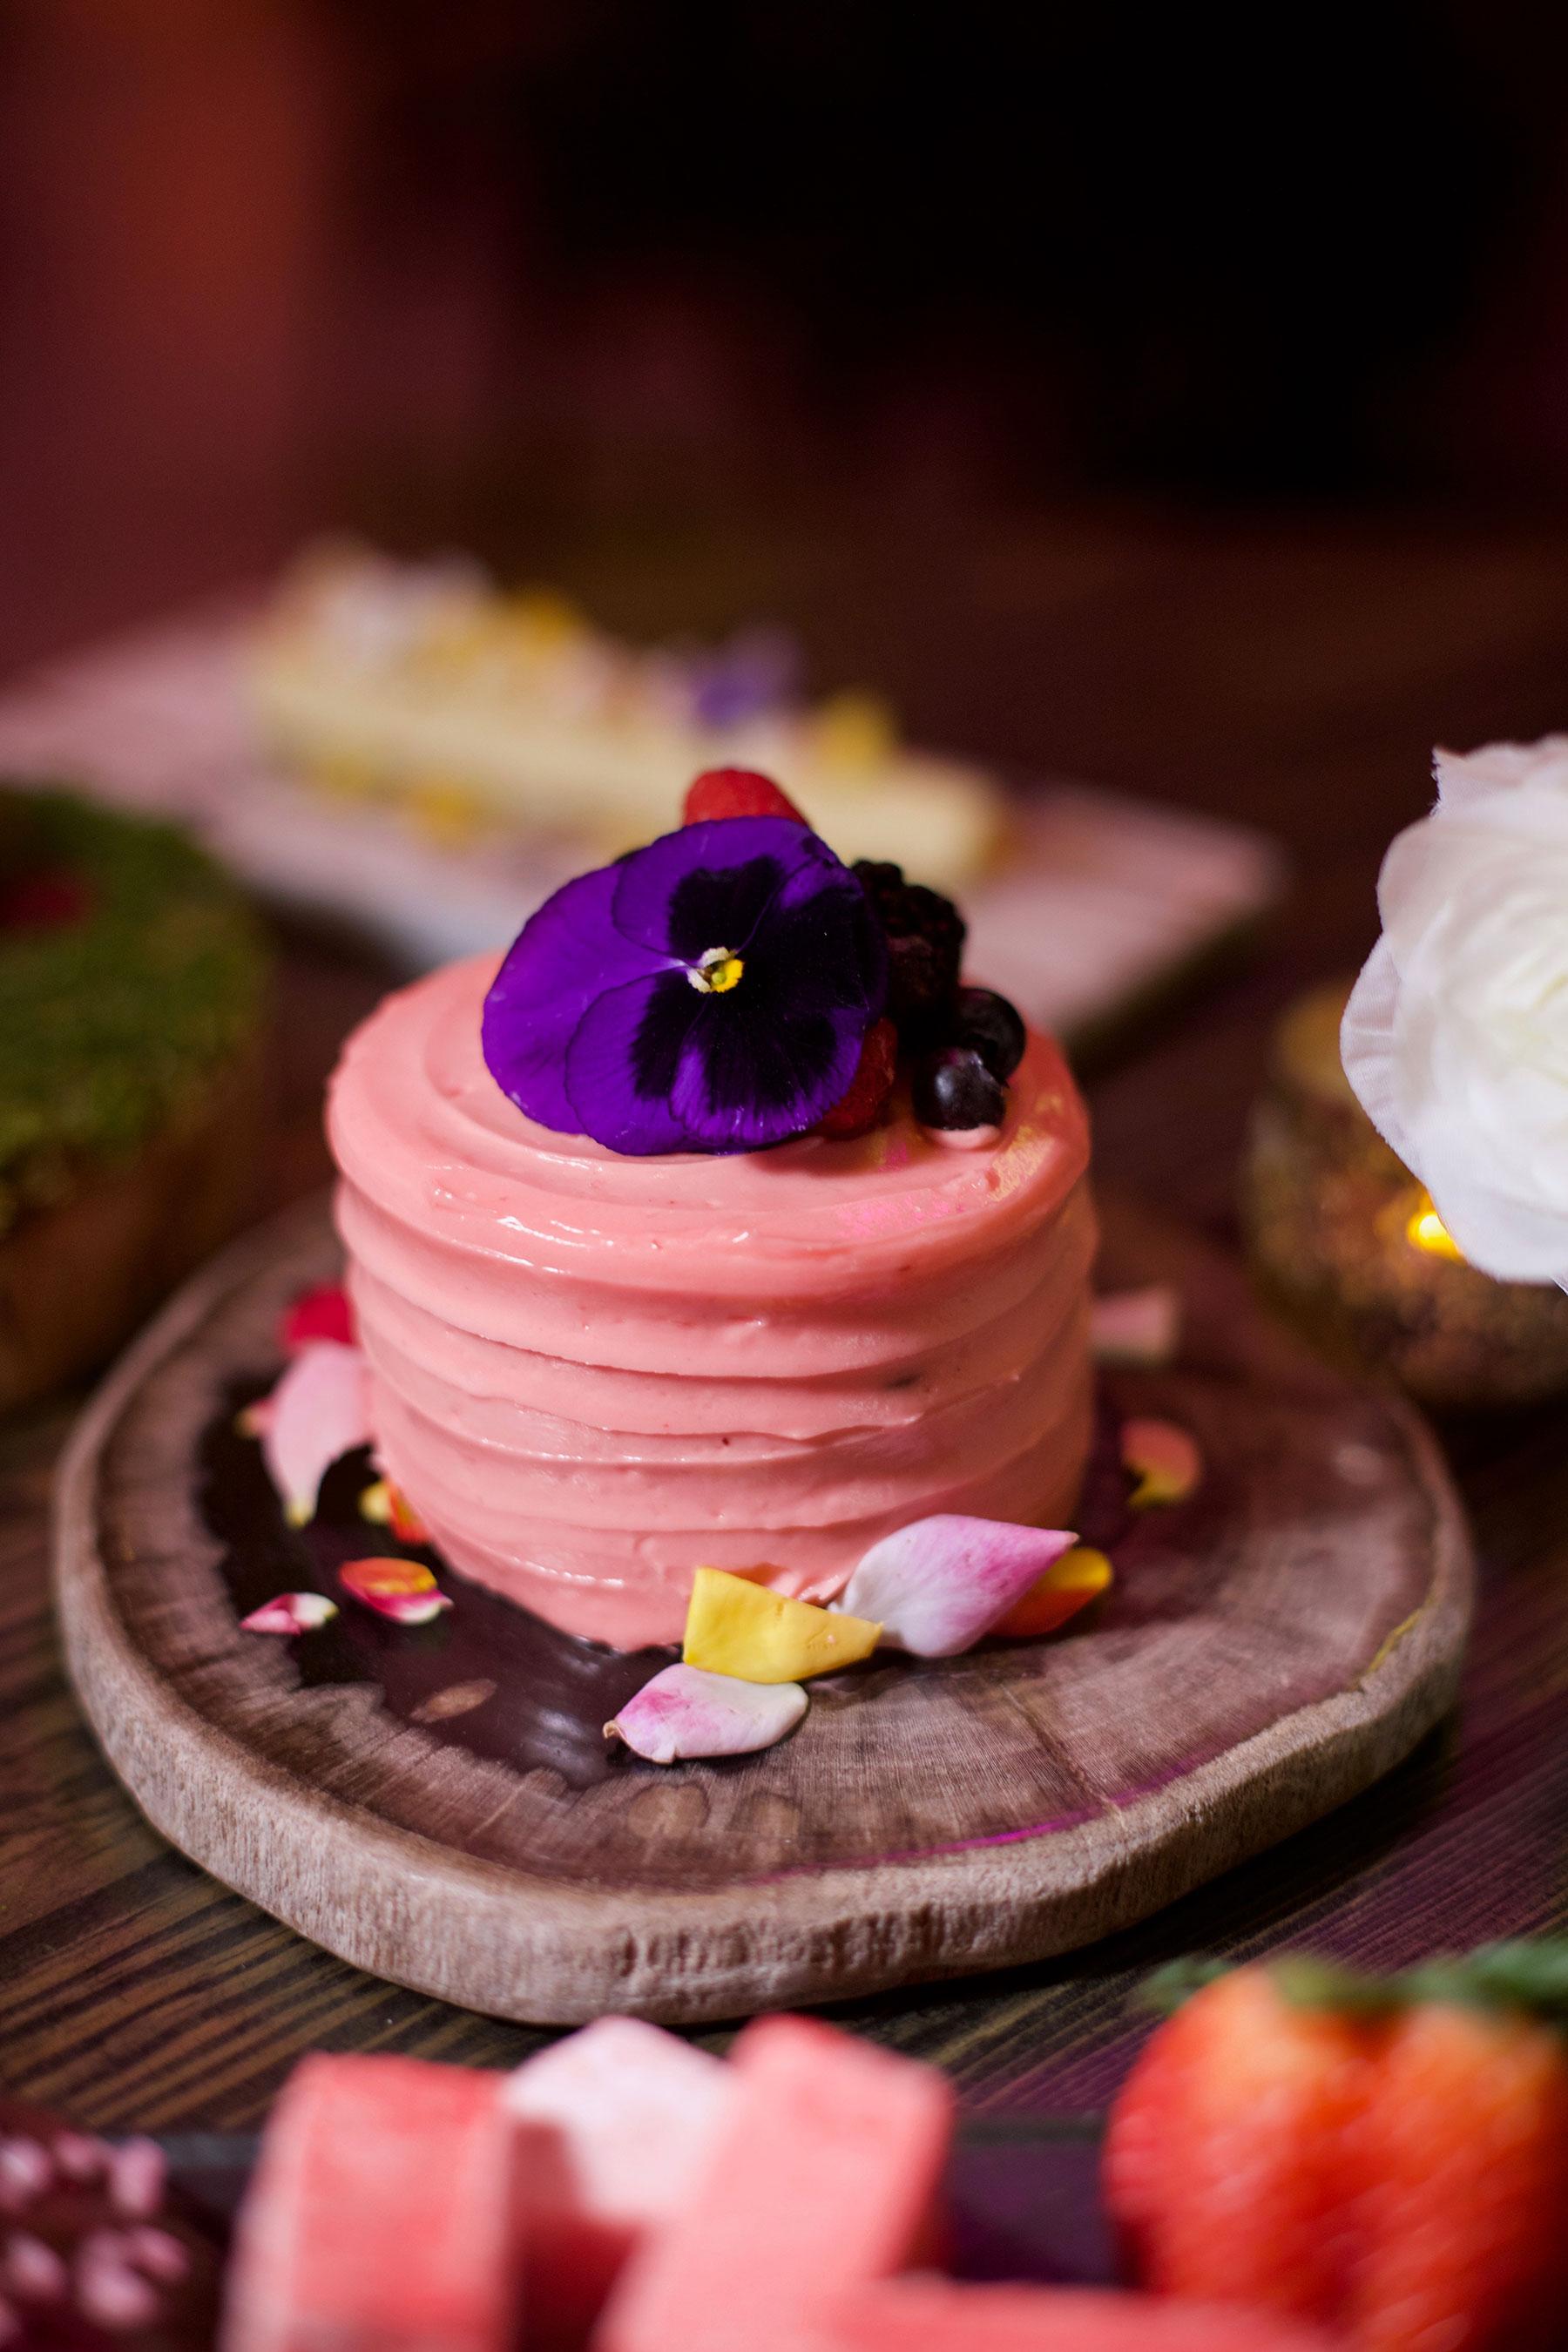 Vanderpump Rose cake